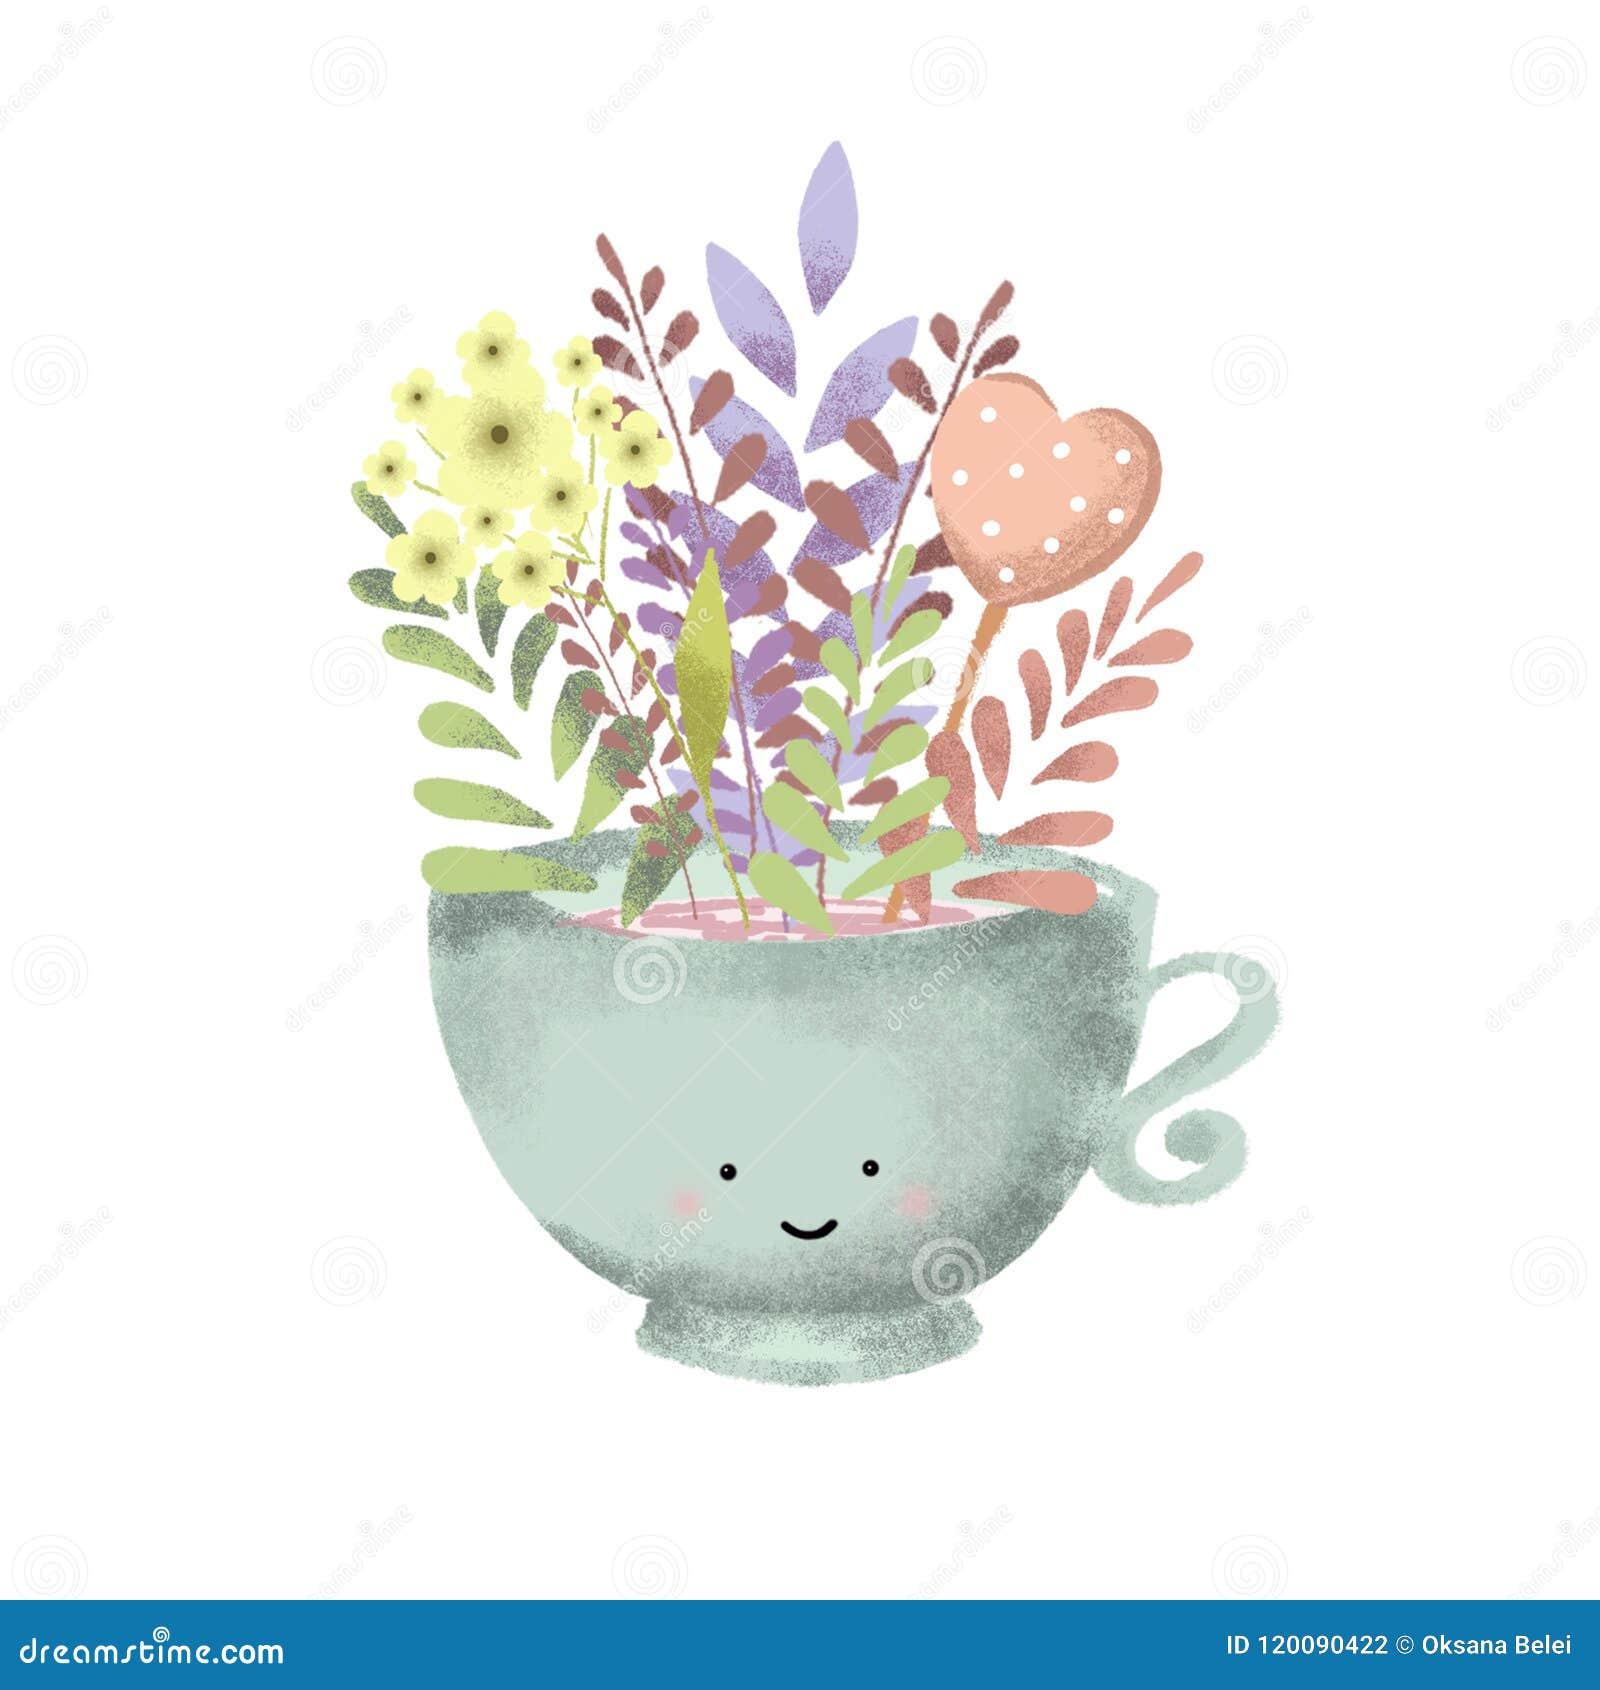 Digital Flower Illustration Stock Illustrations 73 255 Digital Flower Illustration Stock Illustrations Vectors Clipart Dreamstime